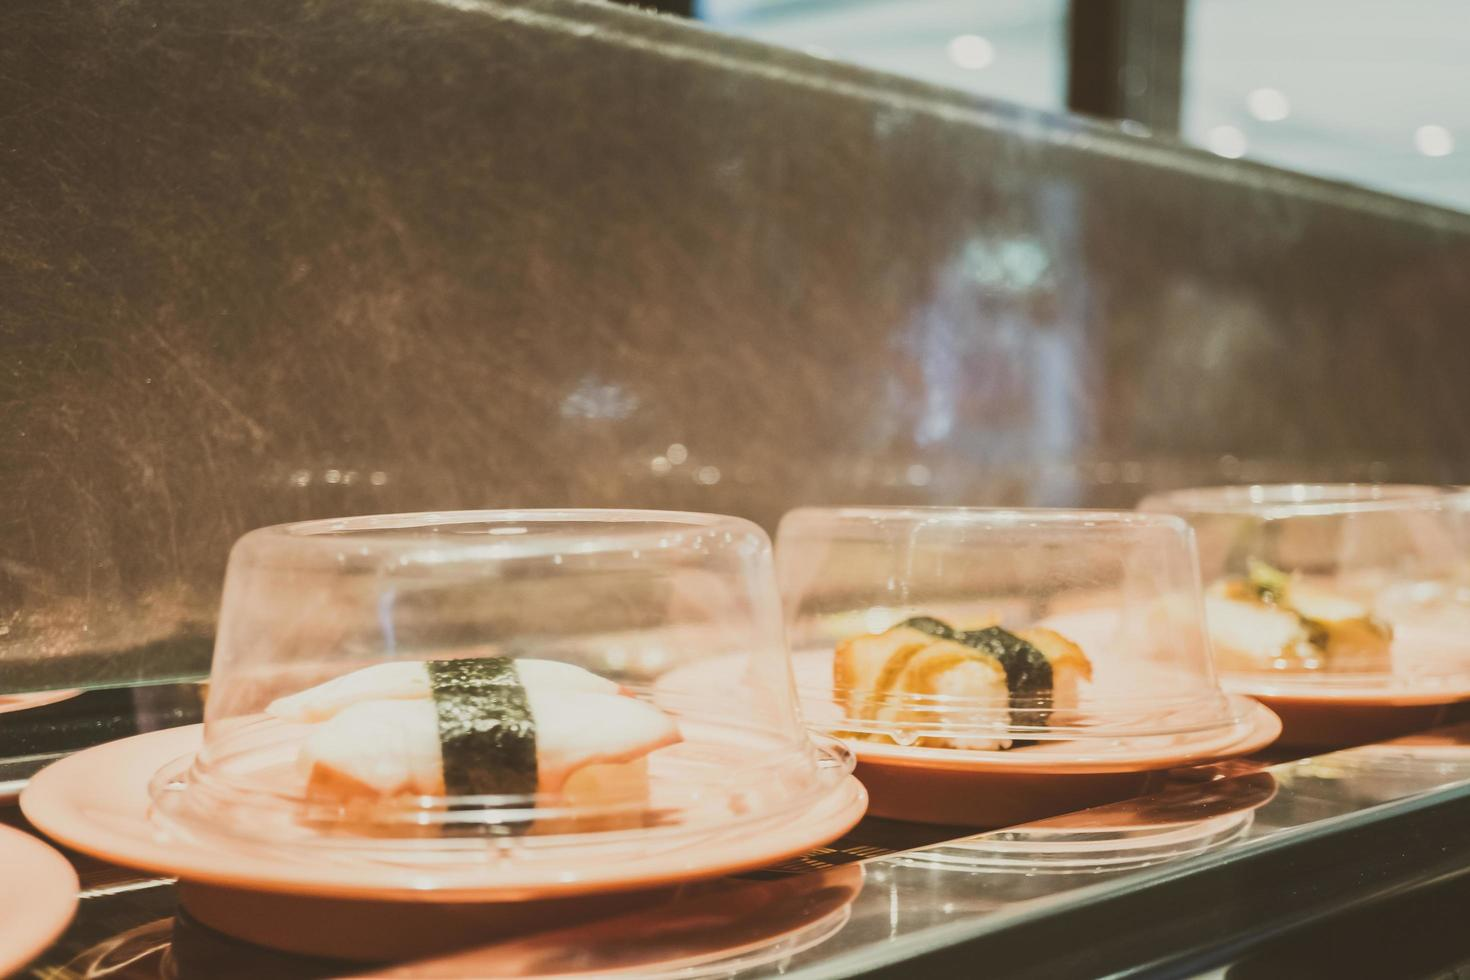 sushifack på transportbandet foto